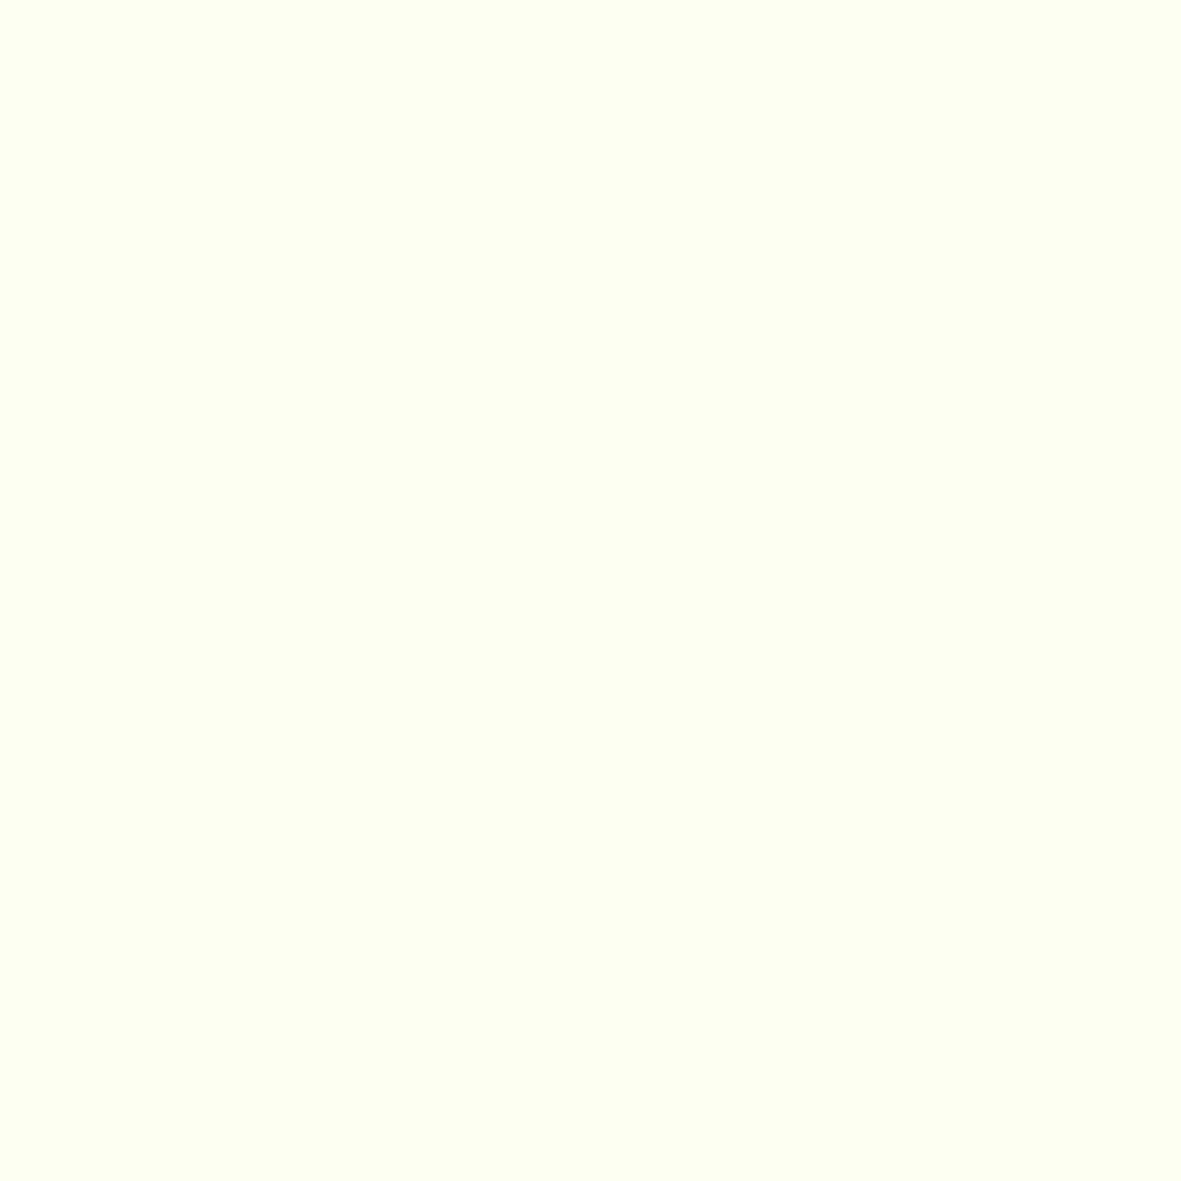 Crystal White 1026